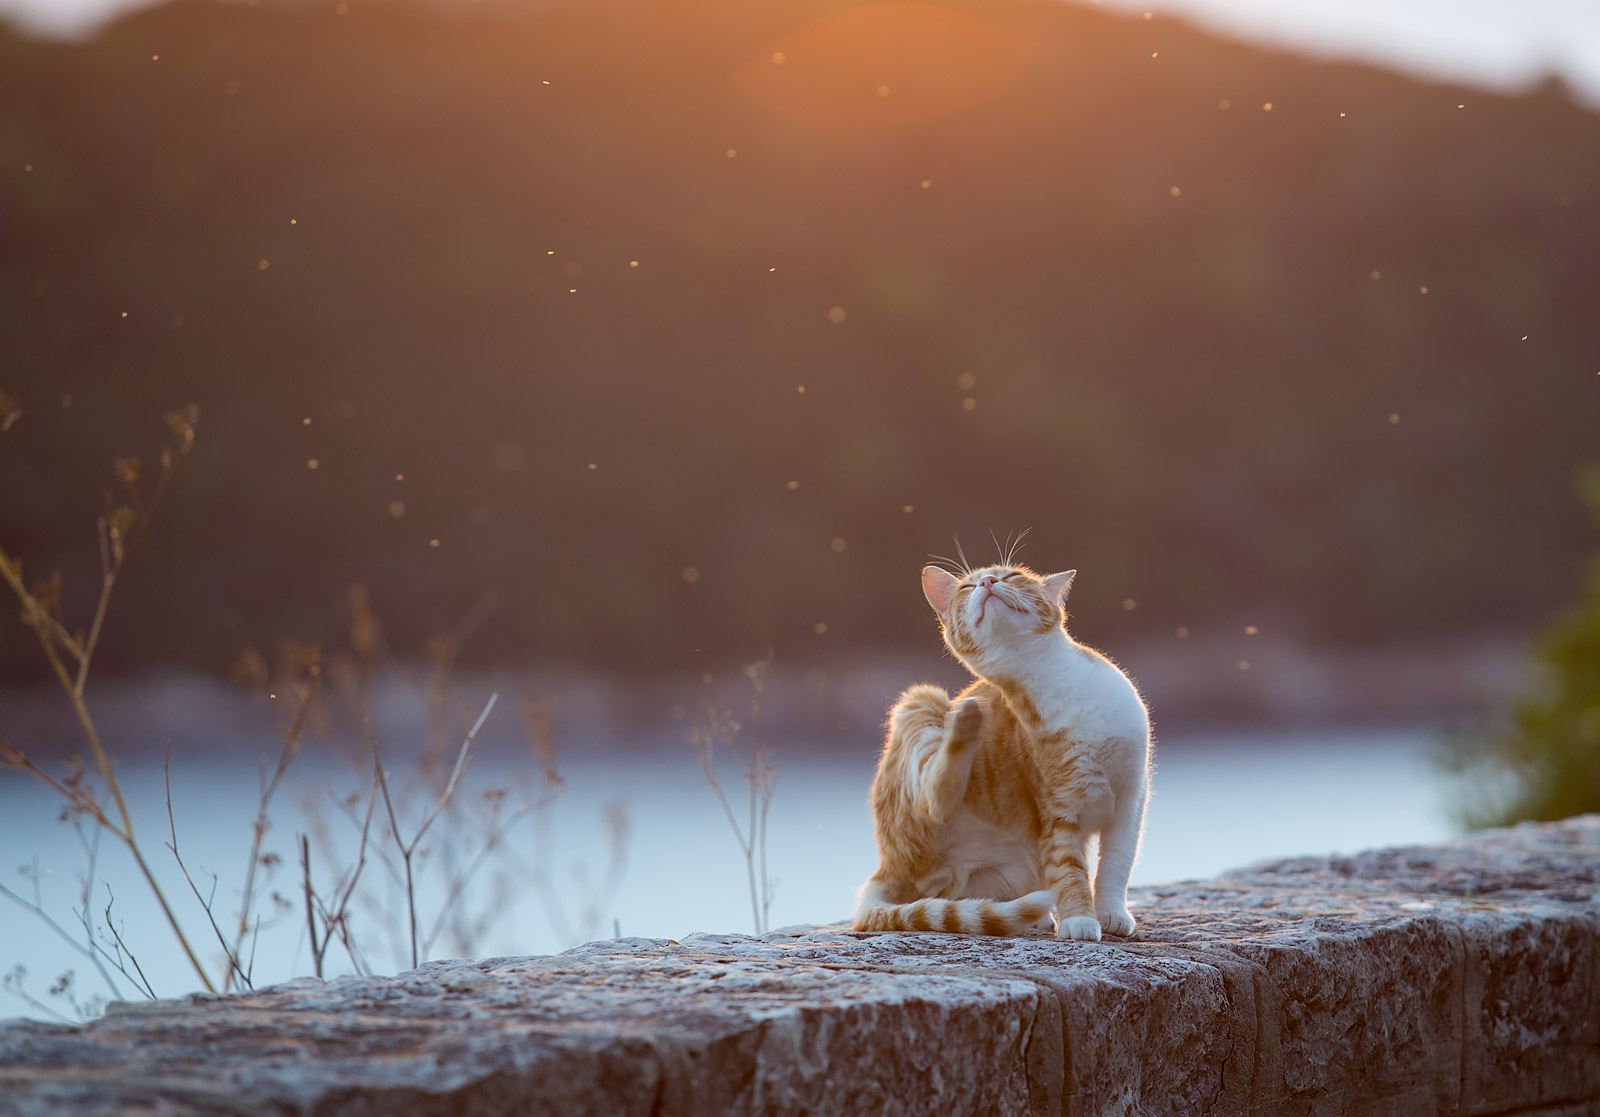 dubrovnik cat at sunset